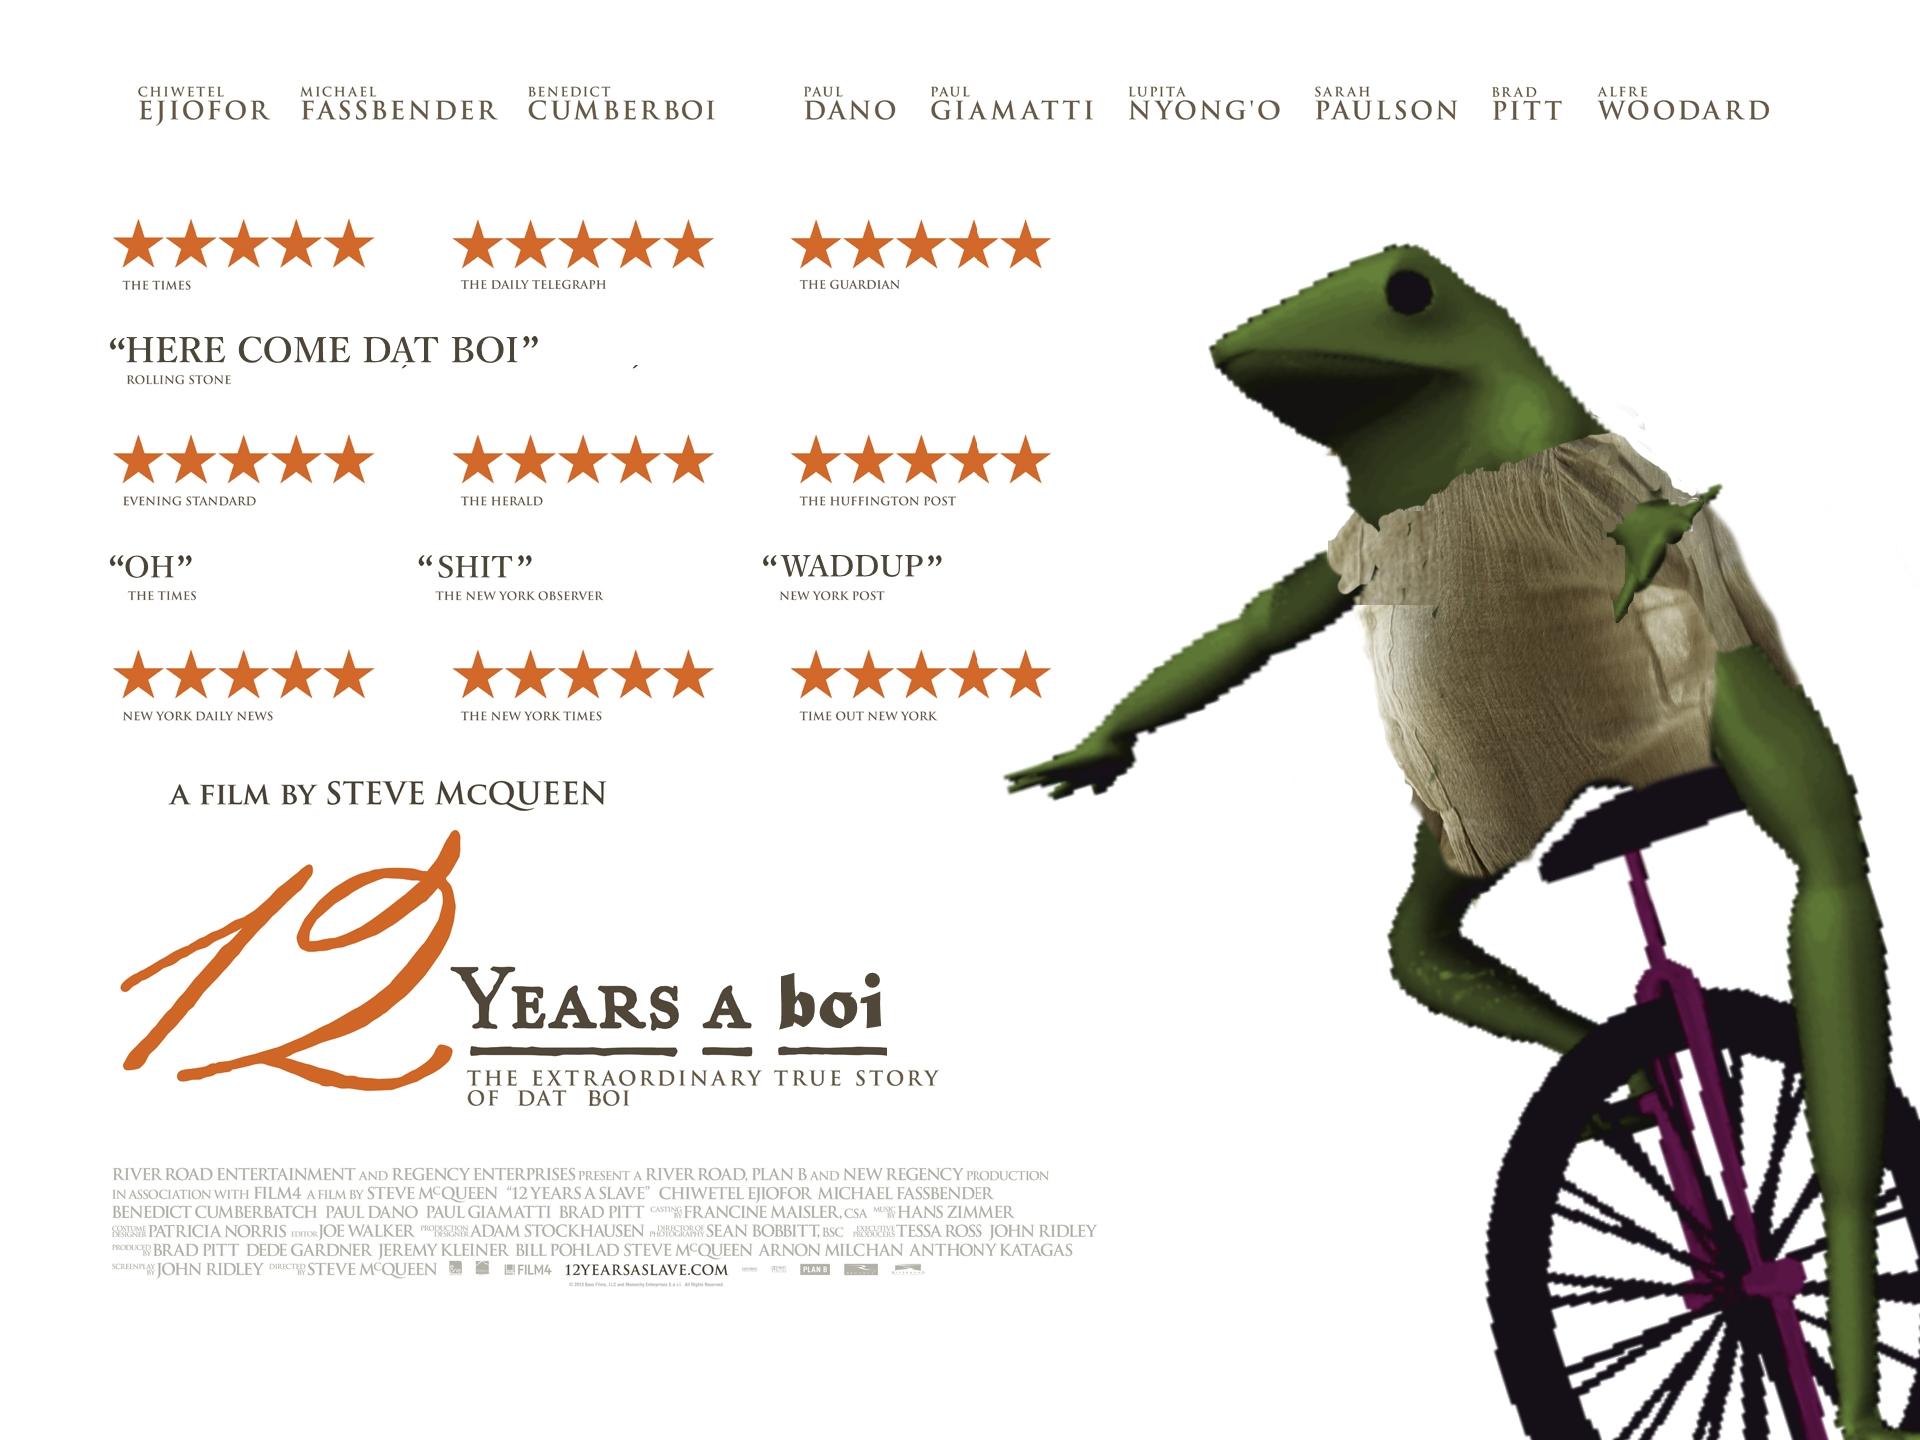 226 12 years a boi dat boi know your meme,Its Dat Boi Meme